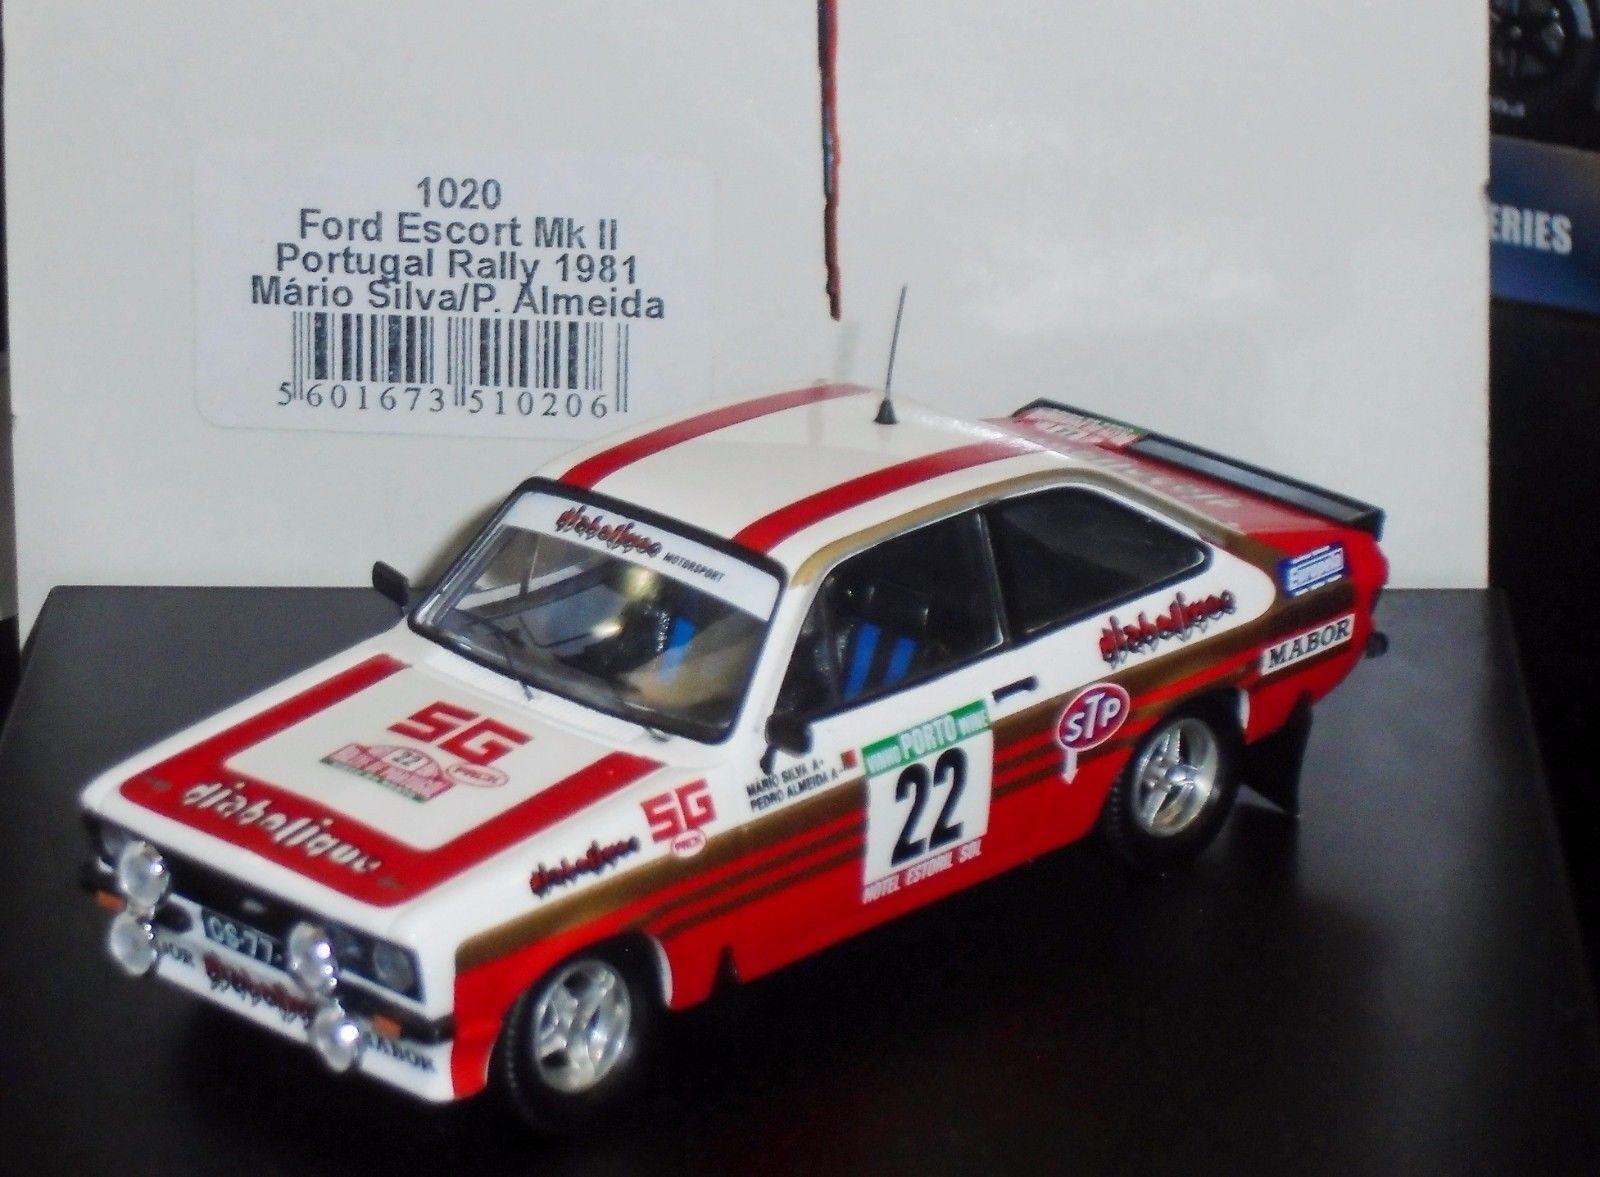 ventas de salida Ford Escort MK2 comparo Portugal Rally Rally Rally 1981  22 M. Silva Trofeu 1020 1 43  buena reputación